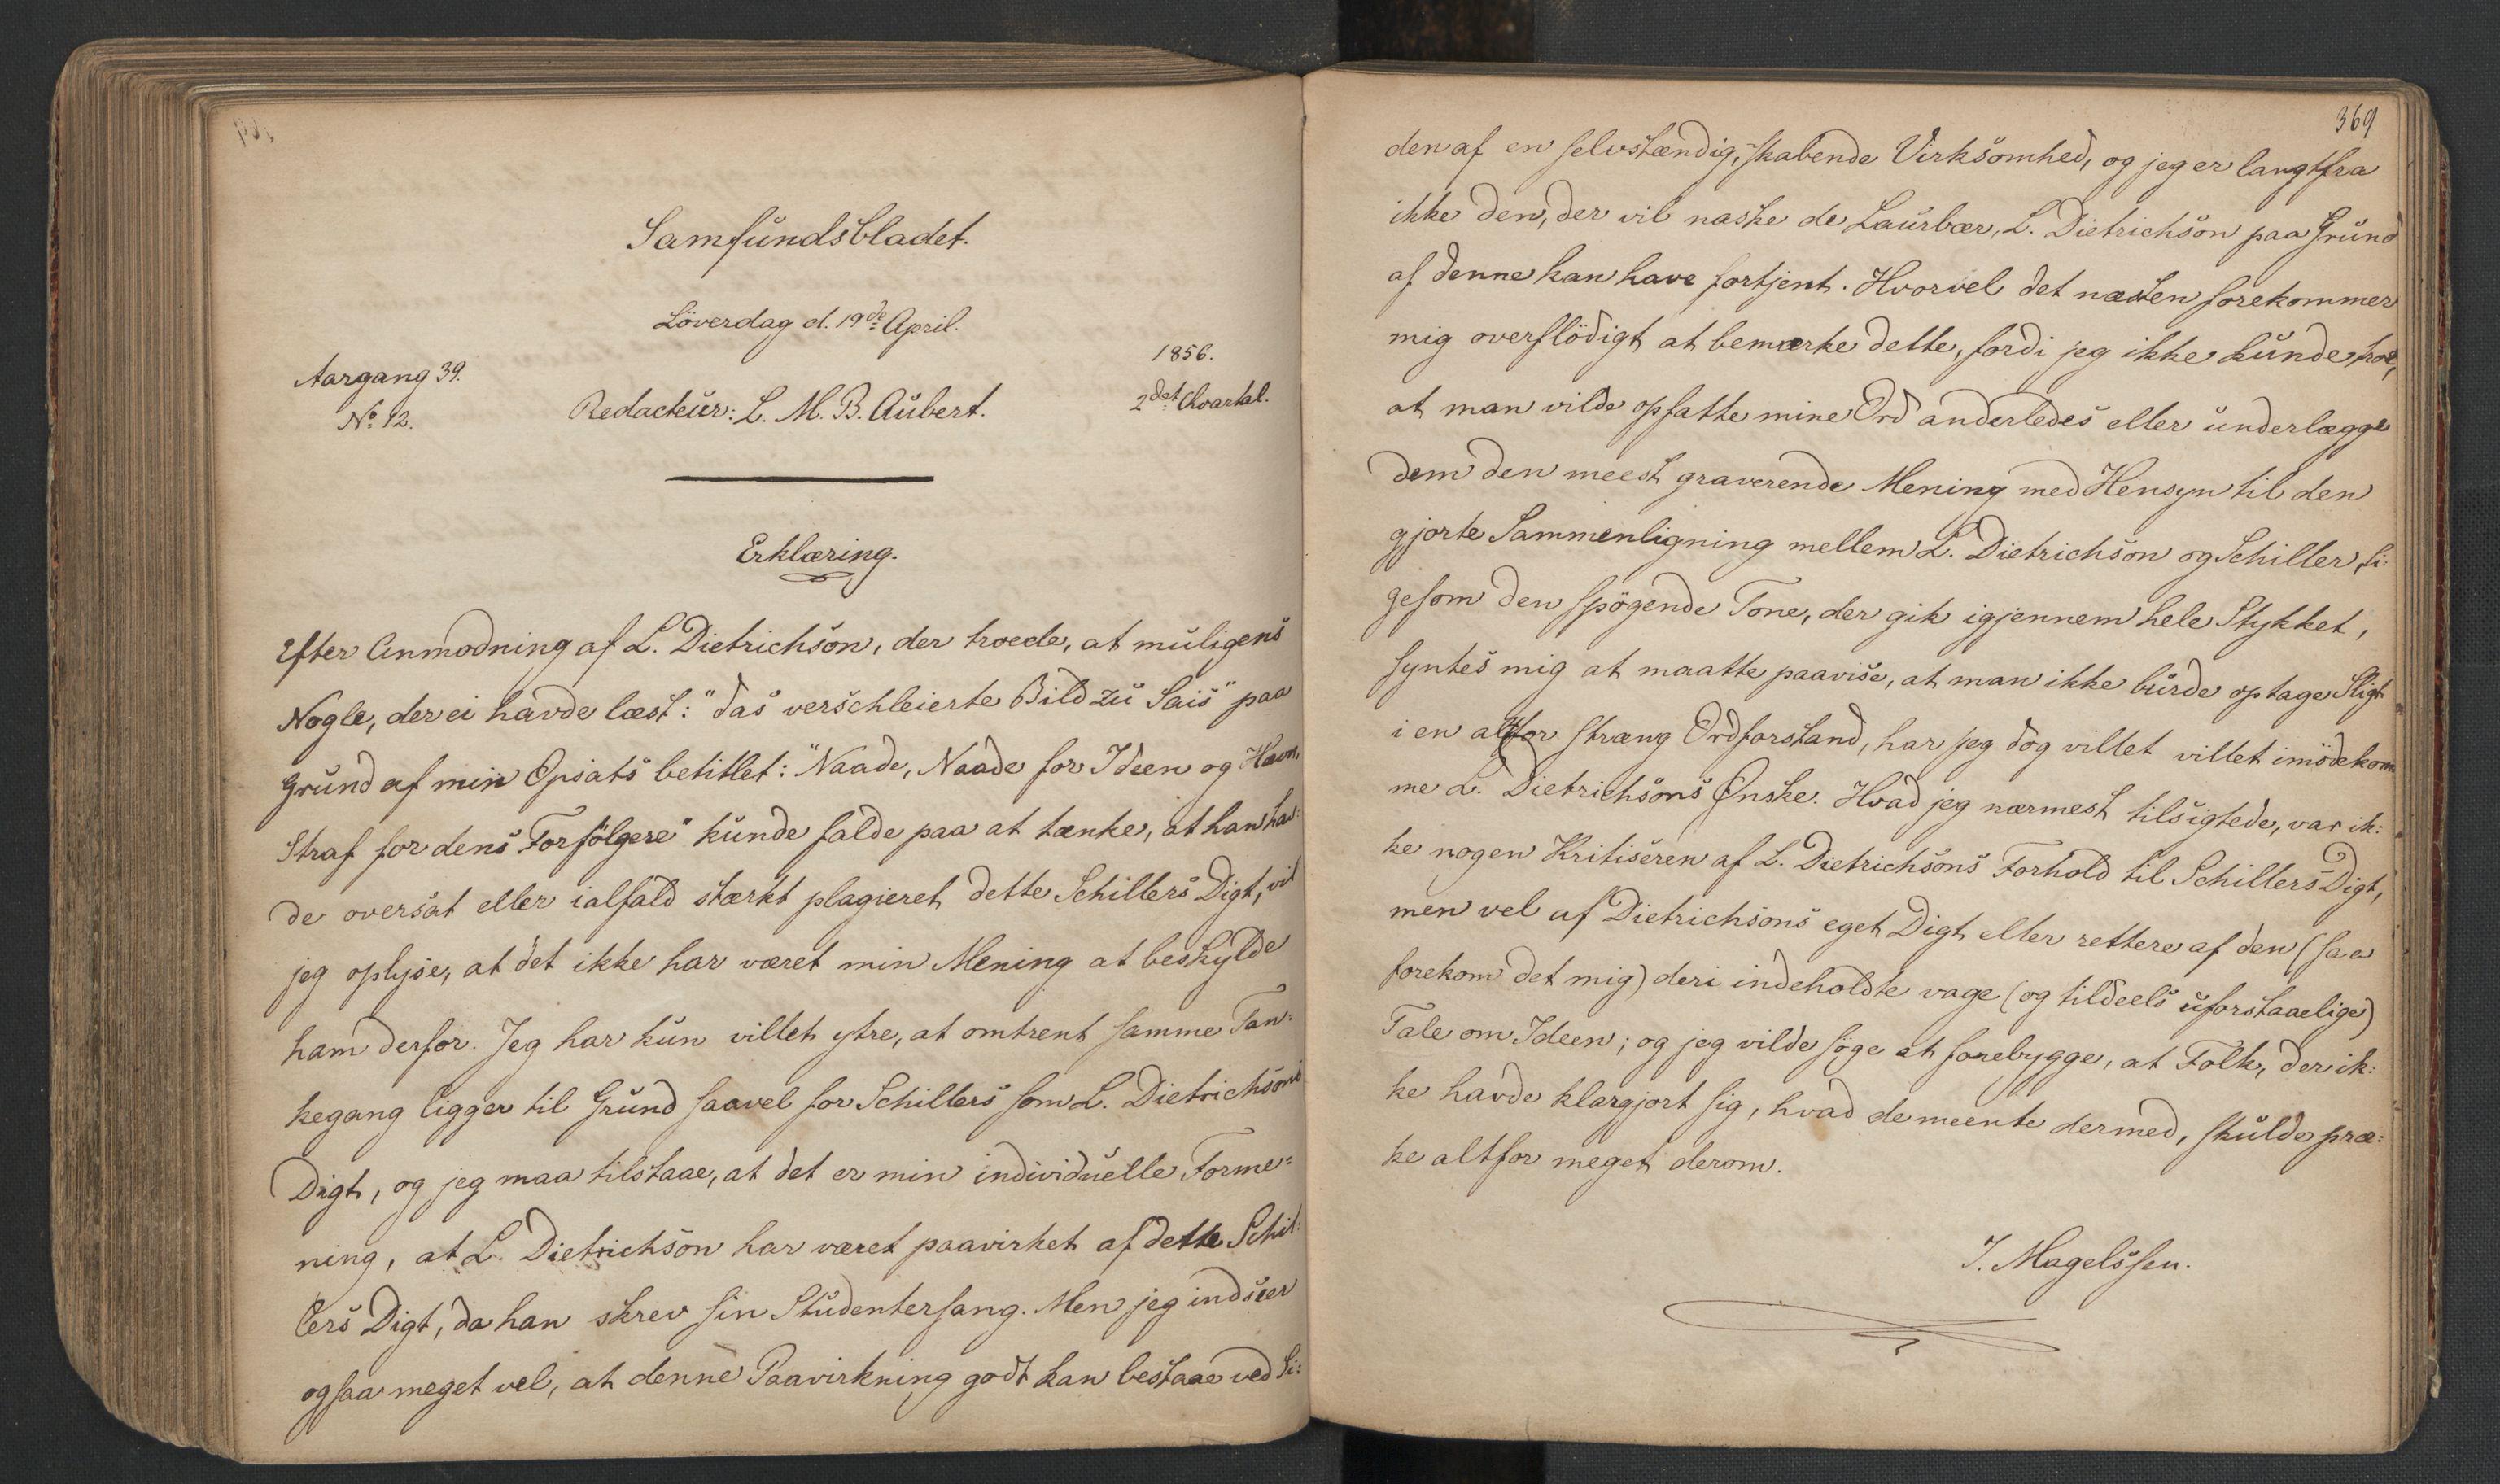 RA, Det Norske Studentersamfund, X/Xa/L0005, 1855-1856, s. 187